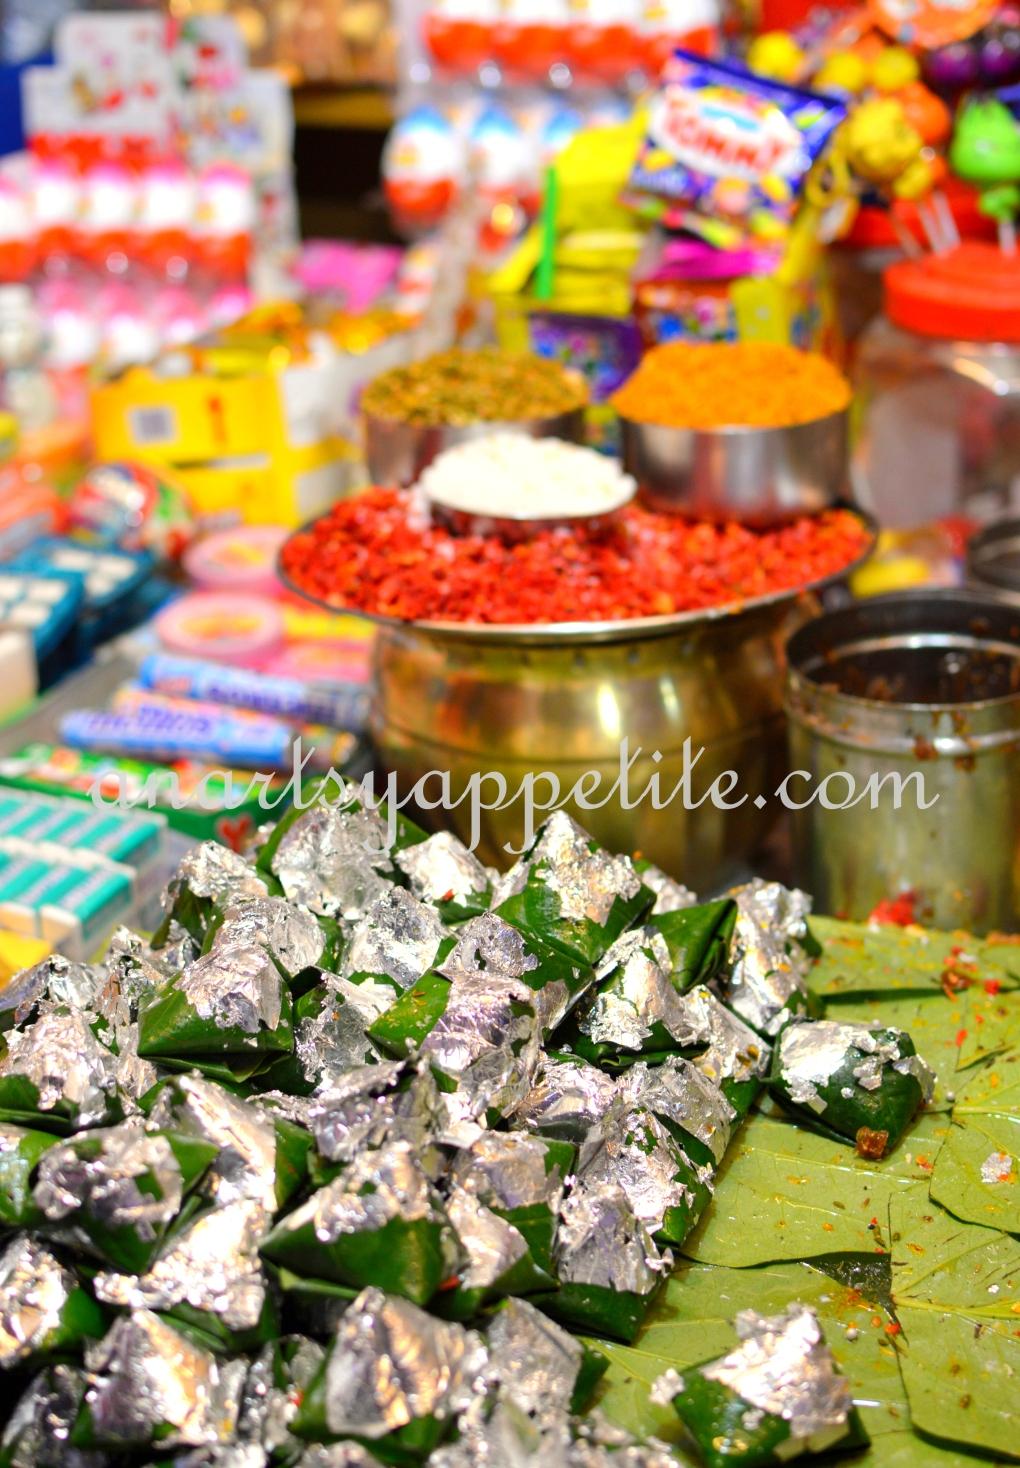 Kolkata winter and food, restaurant food in Kolkata, Kolkata eating , paan, indian paan, beeltle leaf, indian mouth freshener